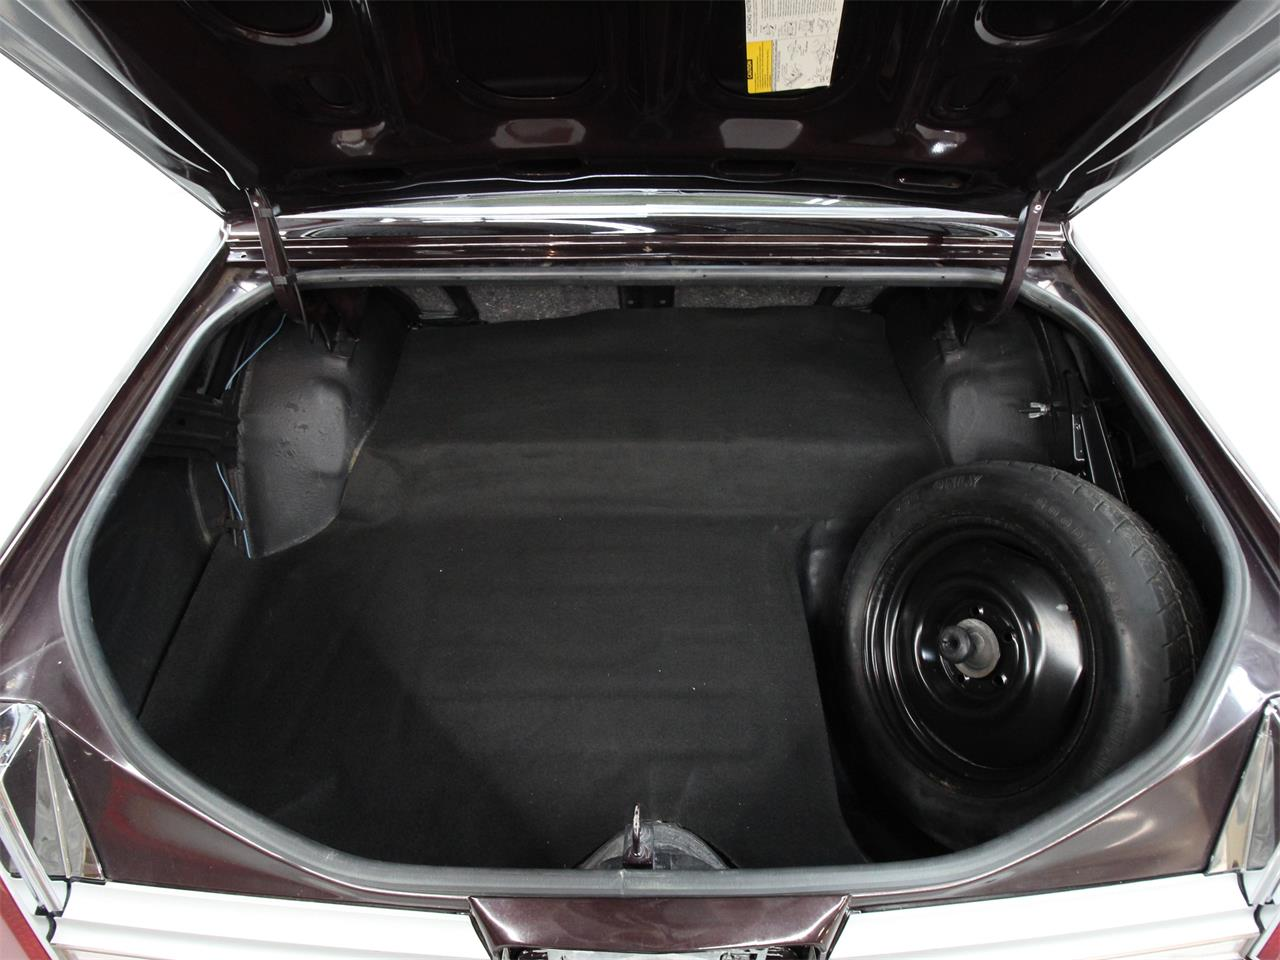 1987 Oldsmobile Cutlass (CC-1337503) for sale in Christiansburg, Virginia